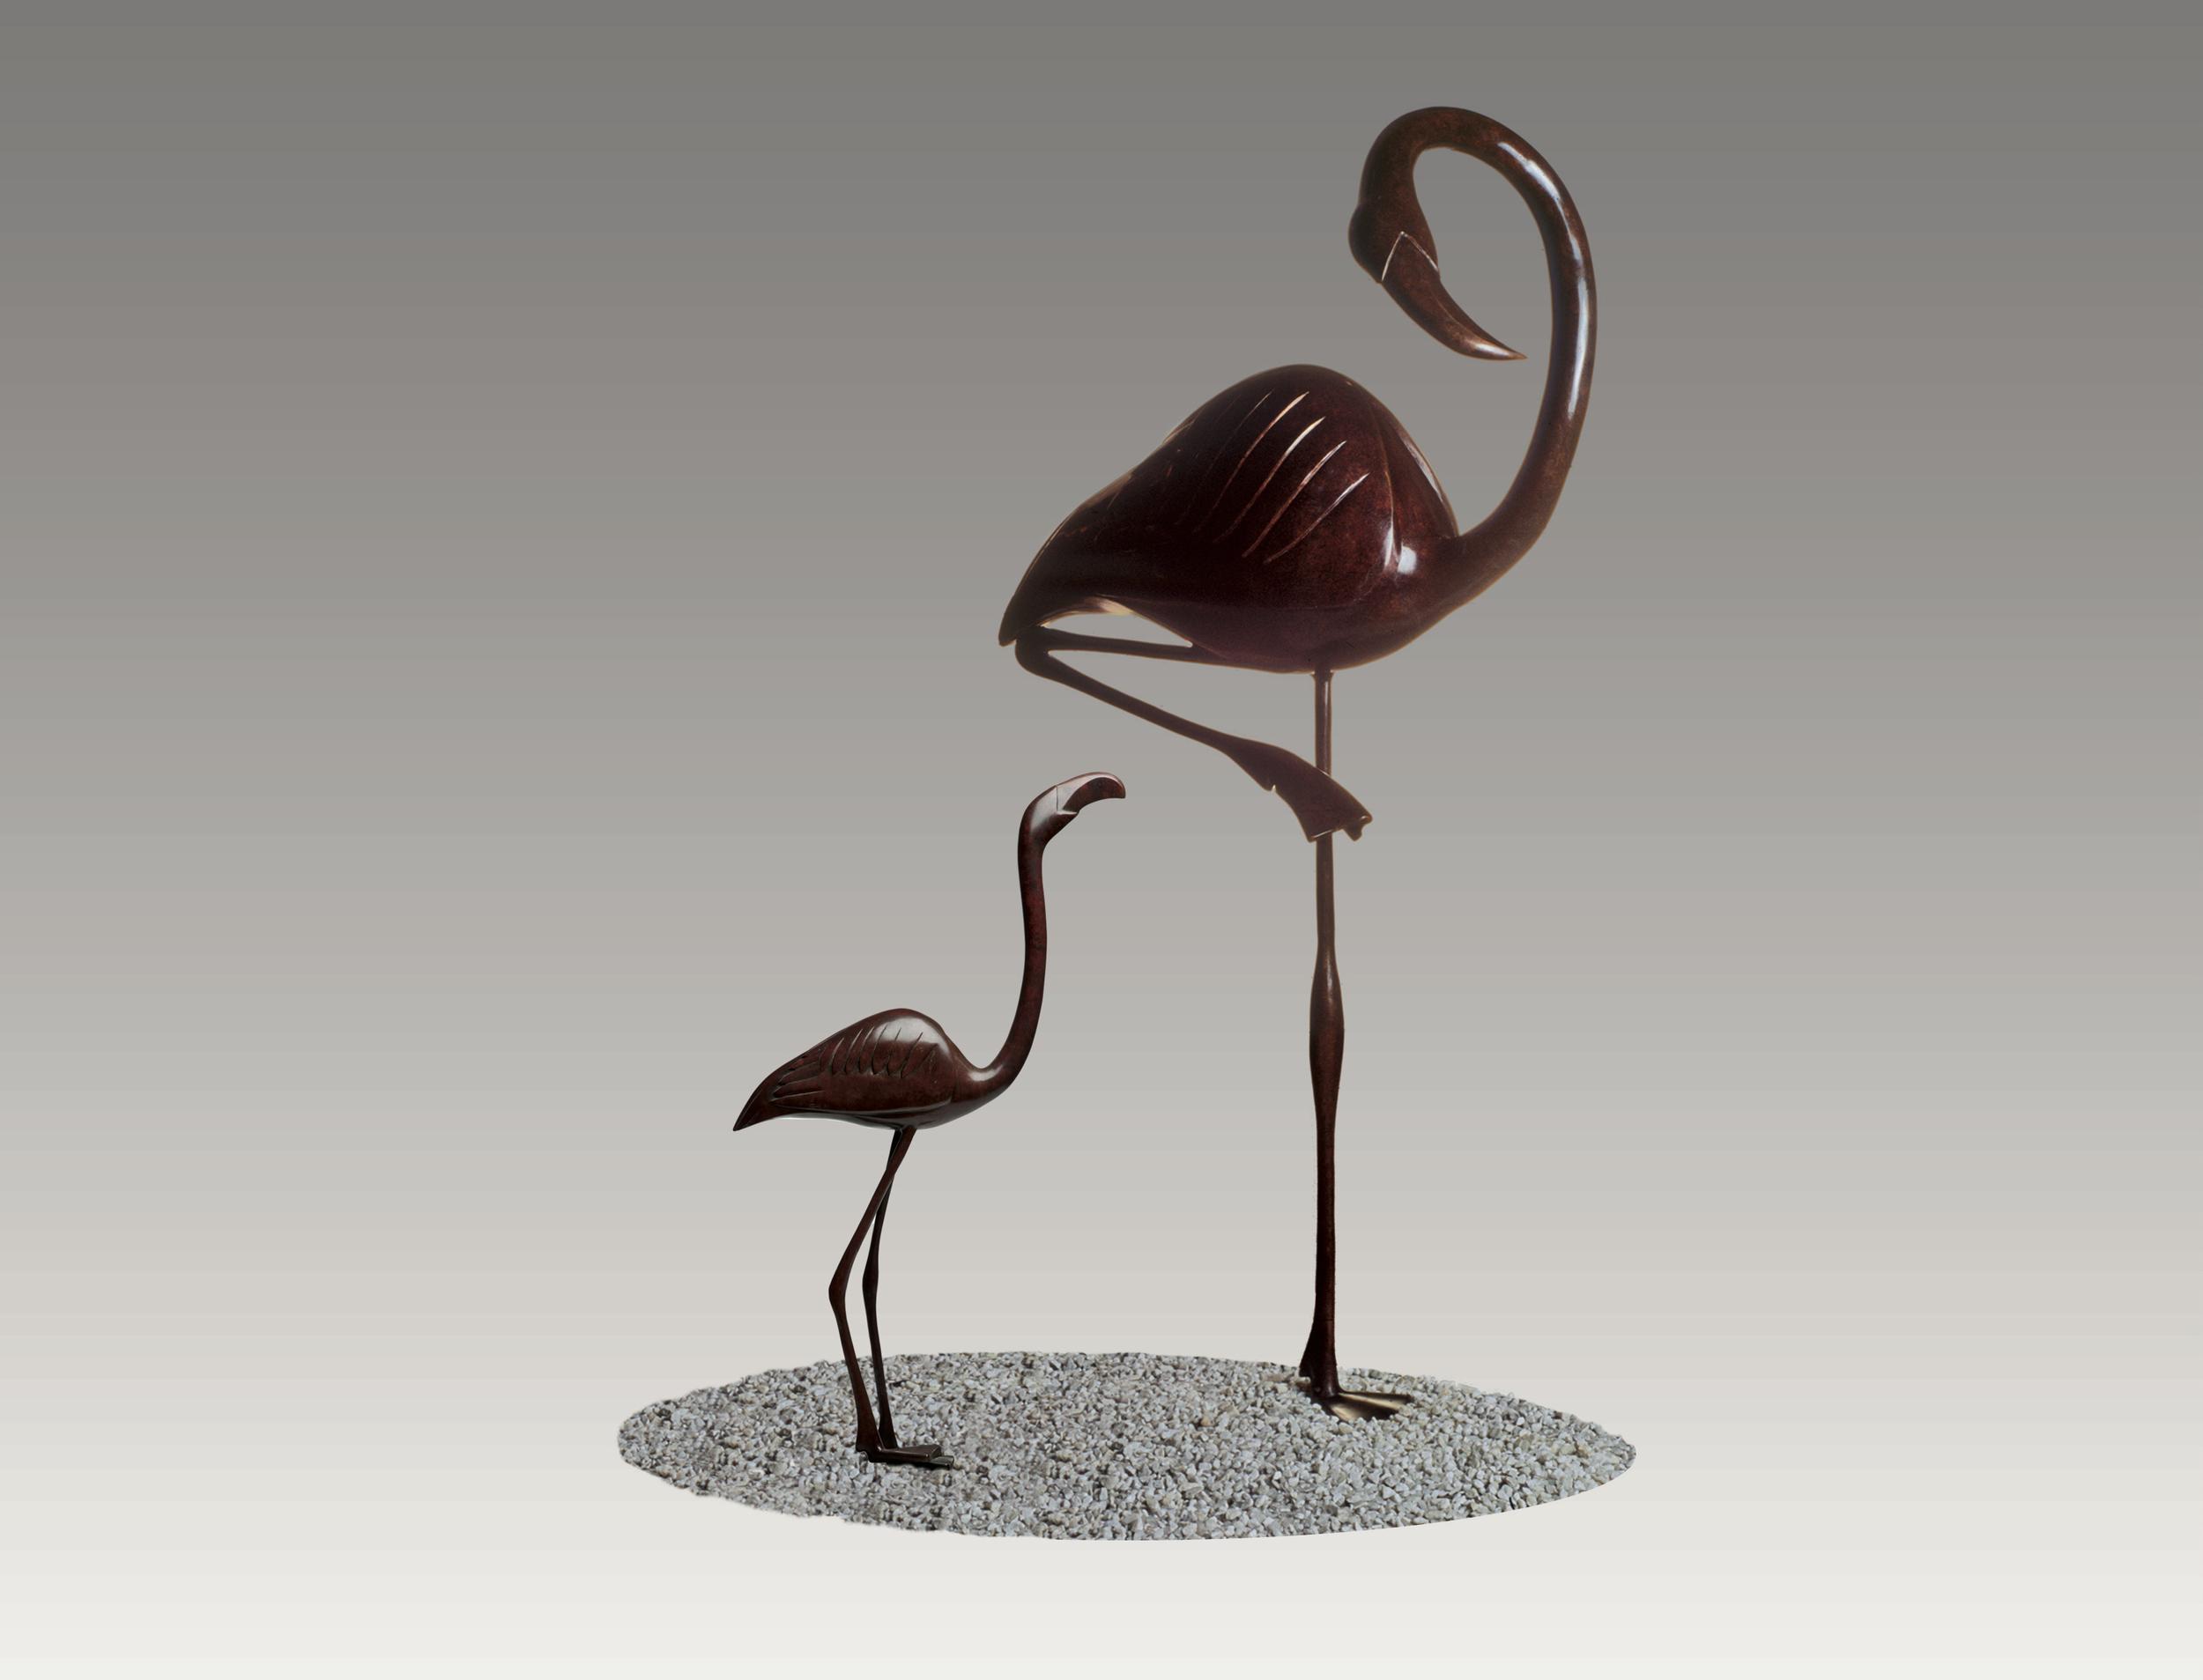 Young Flamingo / Flamingo